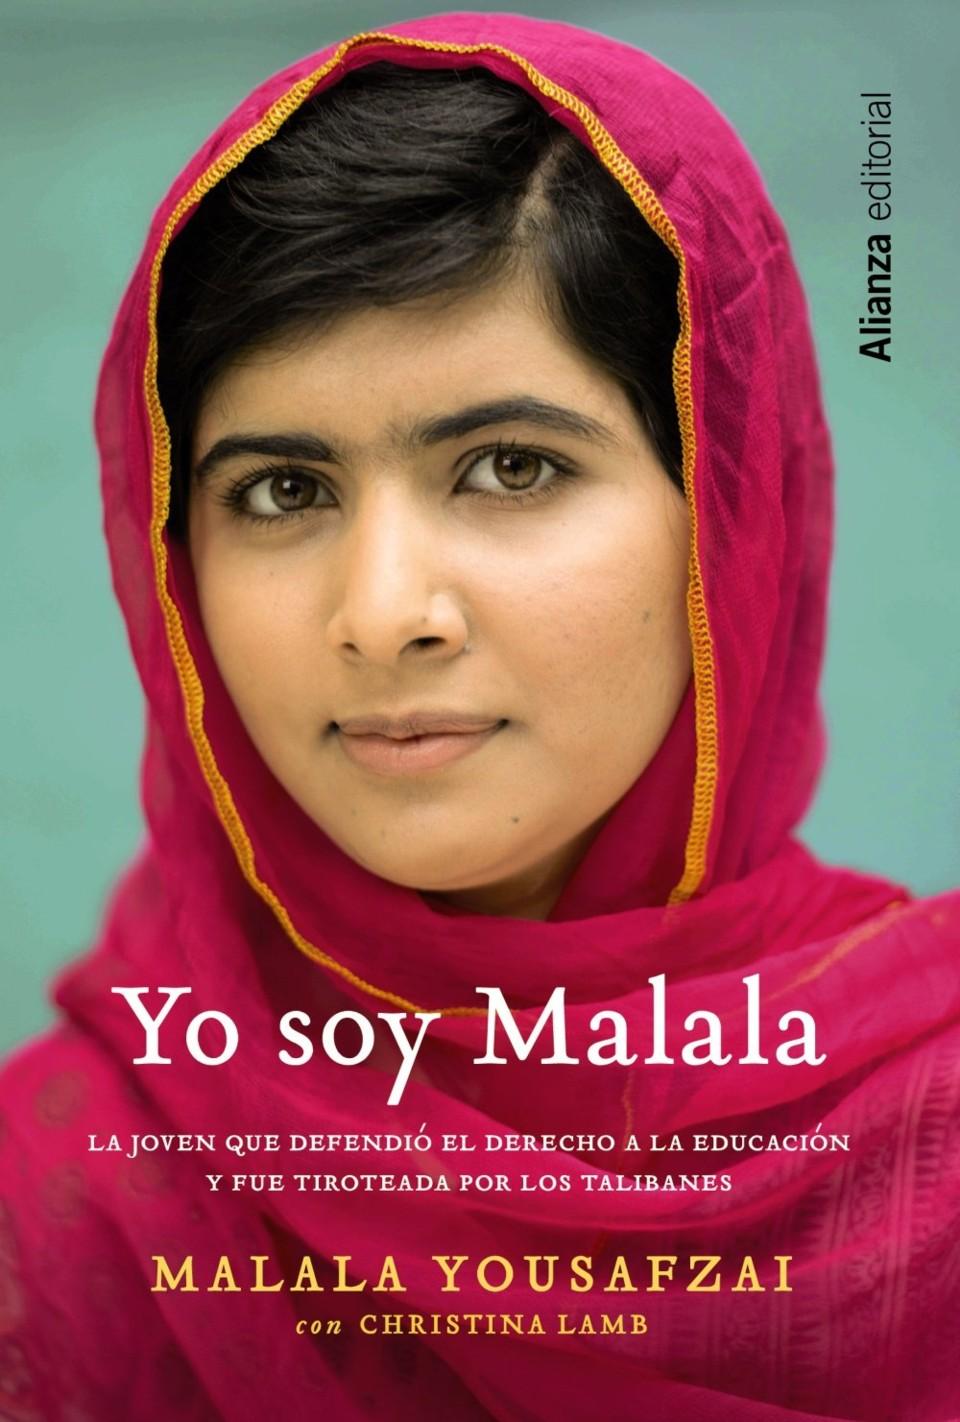 Yo soy Malala, de Malala Yousafzai